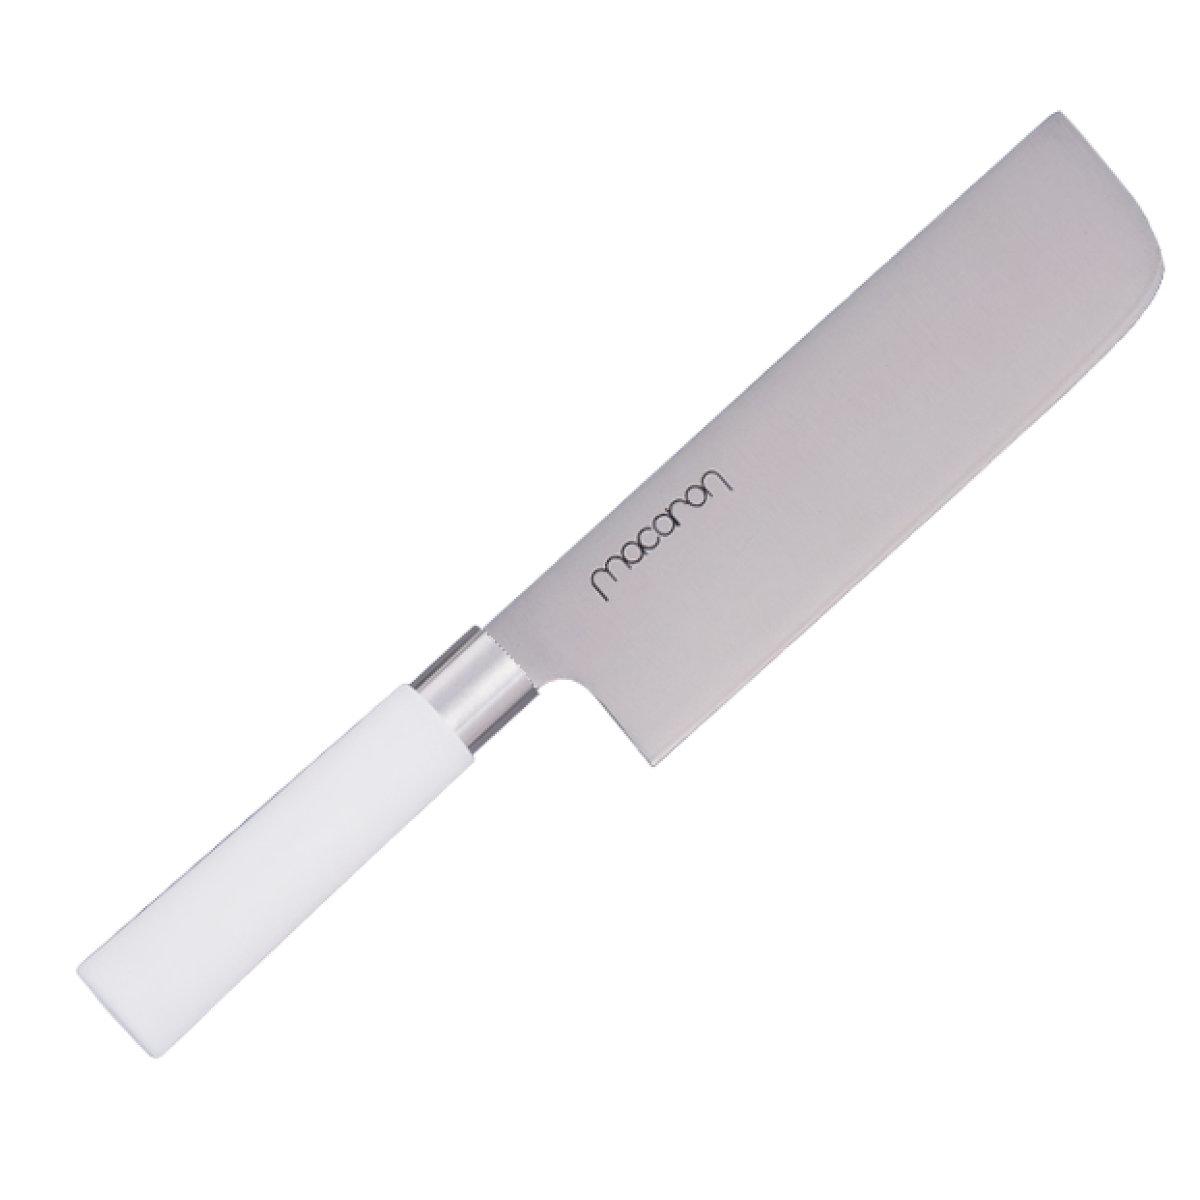 MACARON 菜切包丁